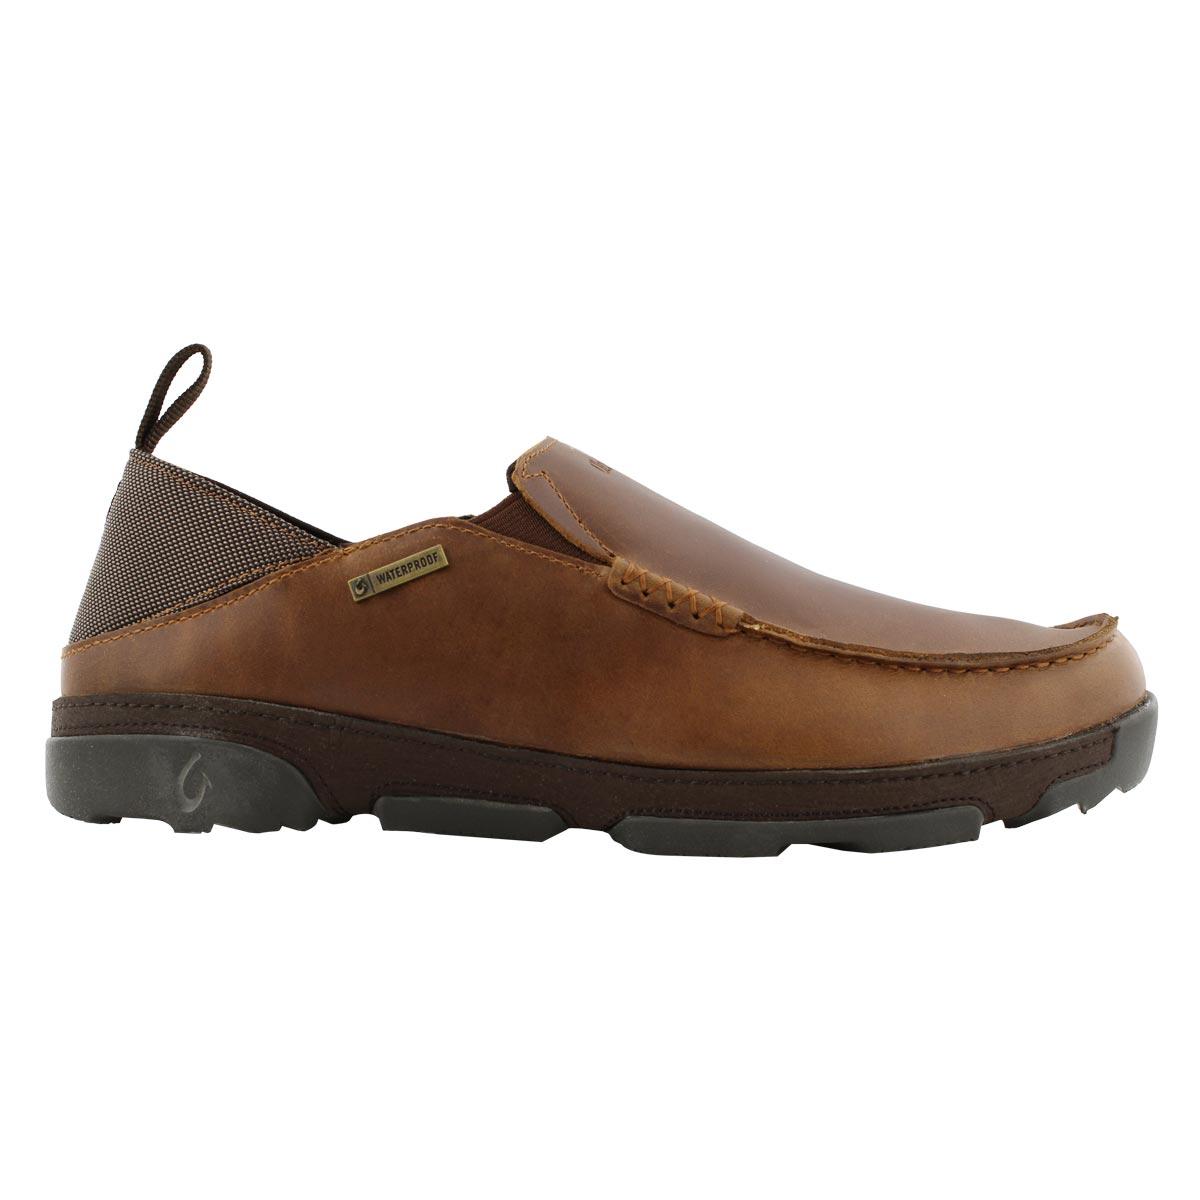 Mns Na'i WP fox/dk wood slipon wtpf shoe